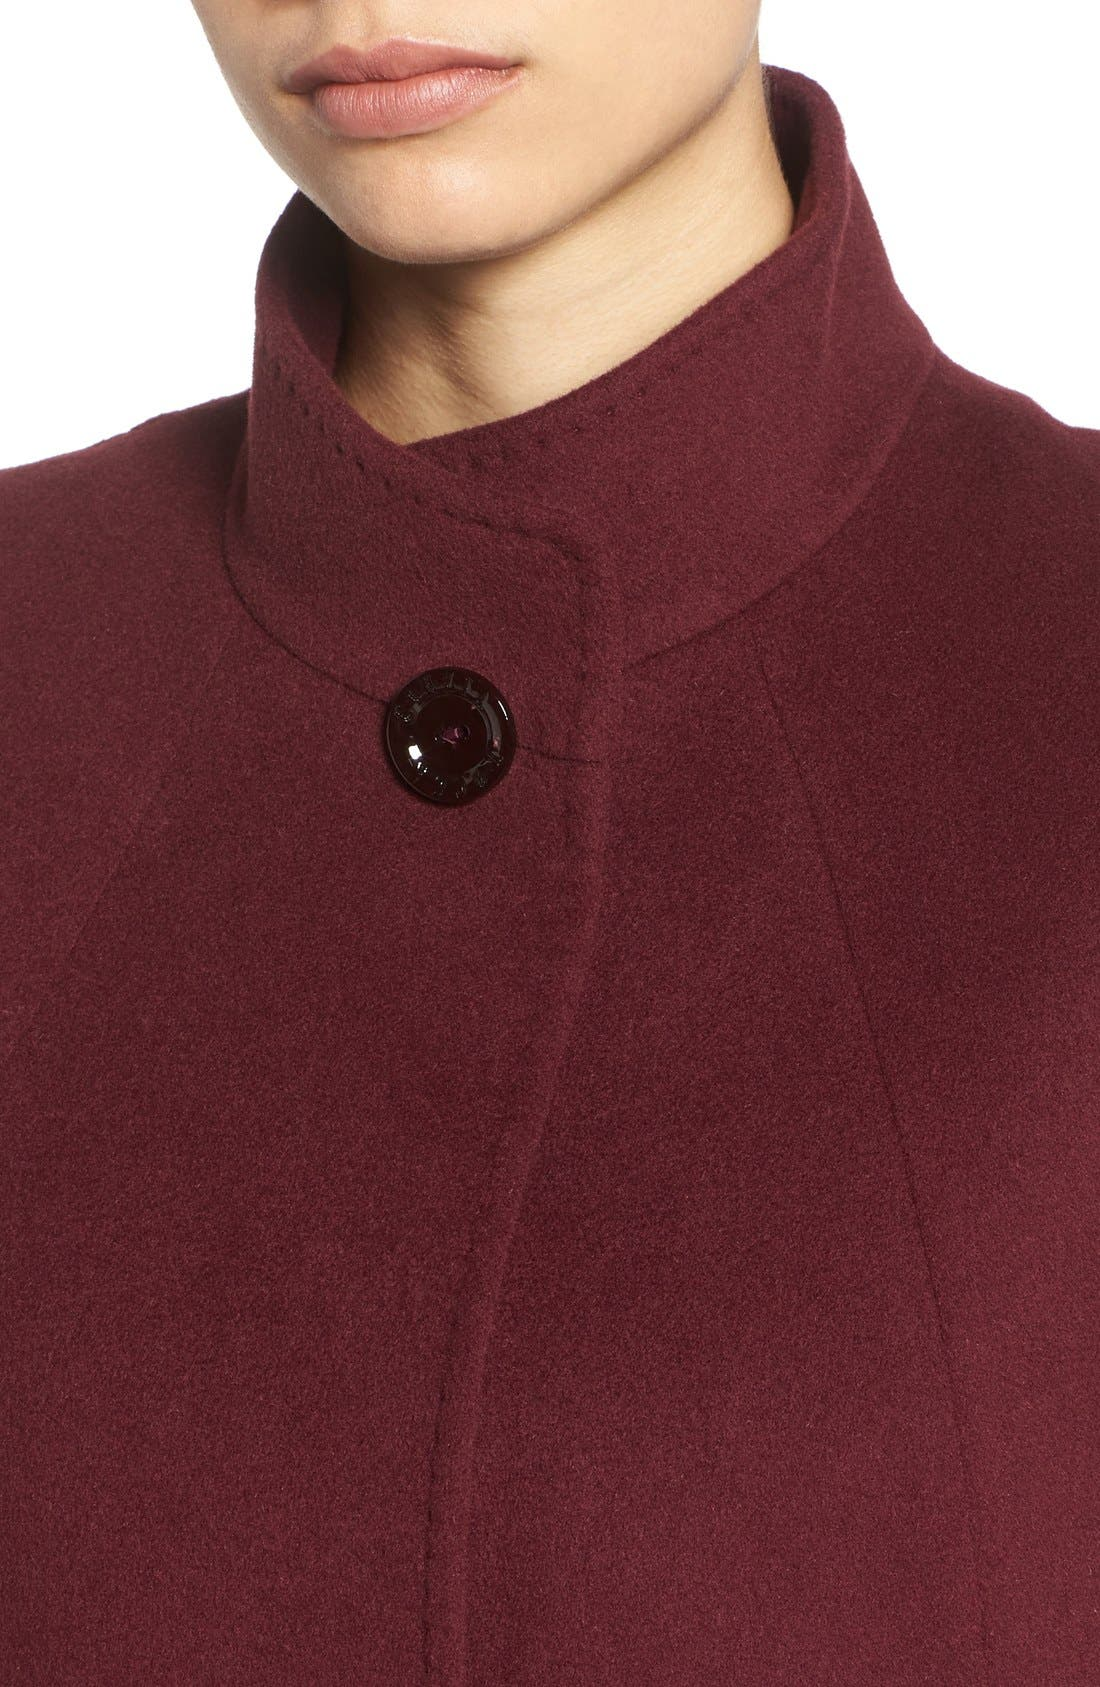 Cinzia Rocca Stand Collar Walking Coat,                             Alternate thumbnail 9, color,